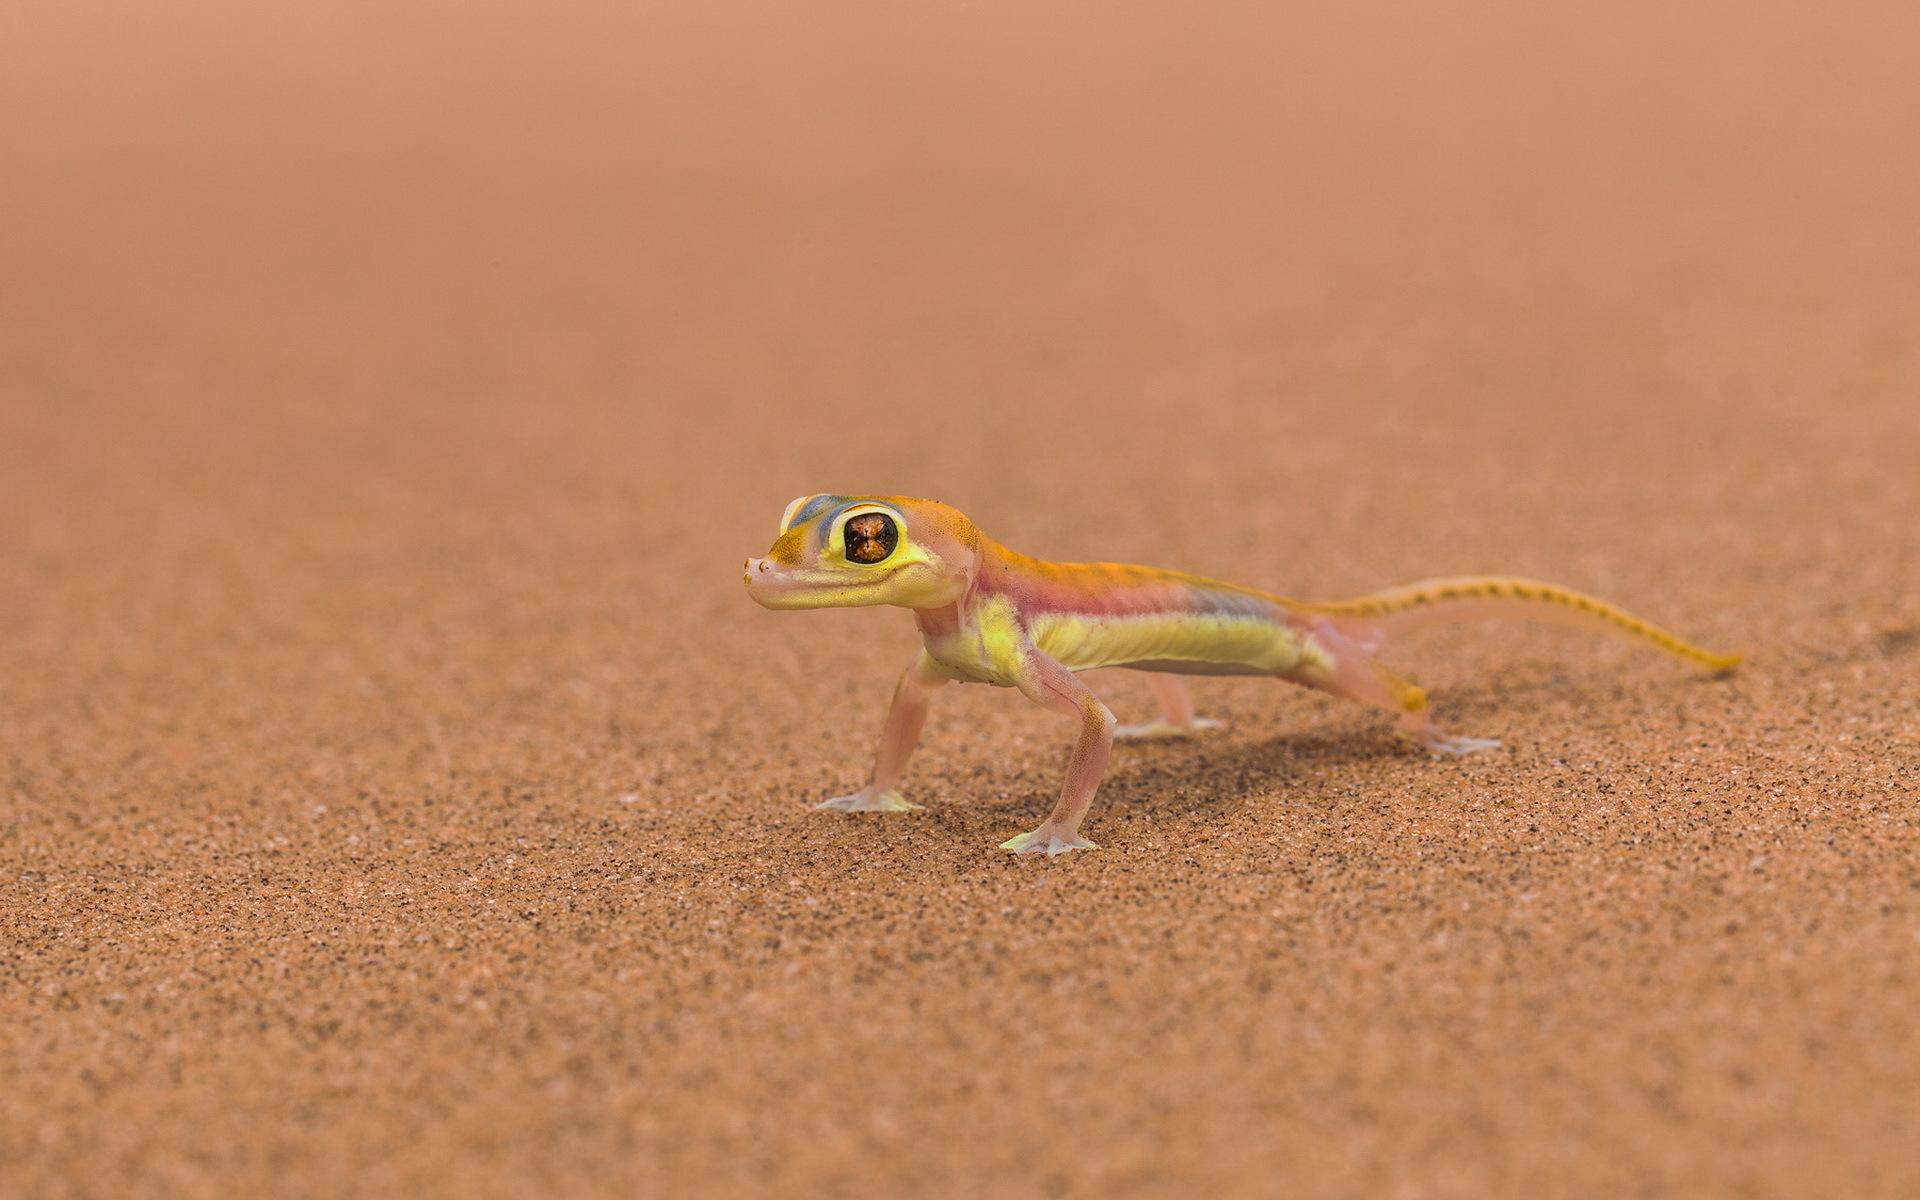 Lizard Full HD Wallpaper and Background 1920x1200 ID327242